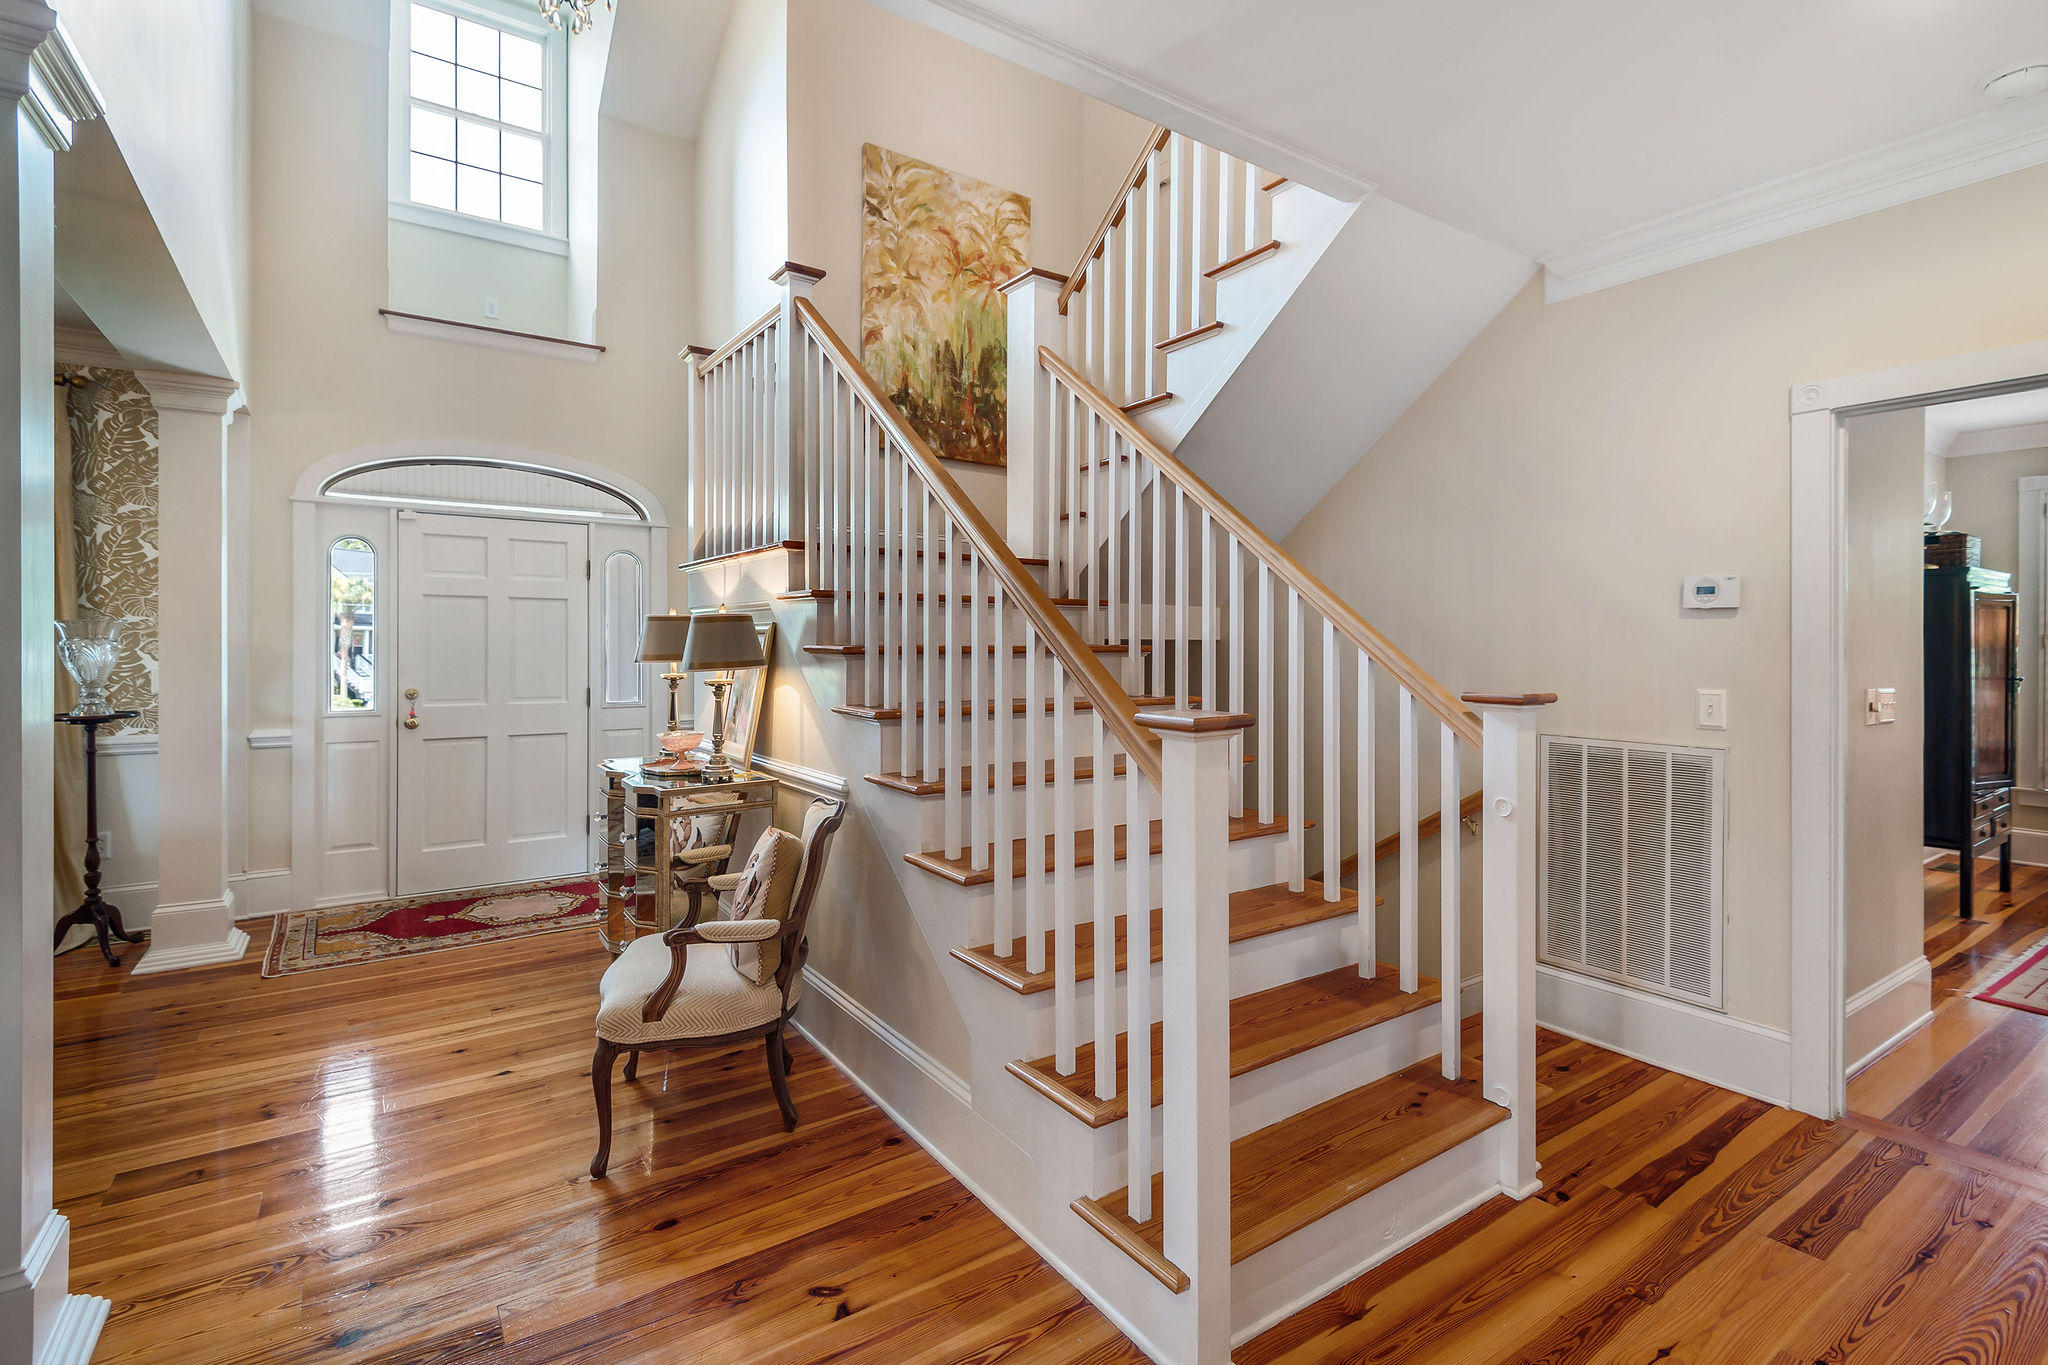 Country Club II Homes For Sale - 1482 Burningtree, Charleston, SC - 54